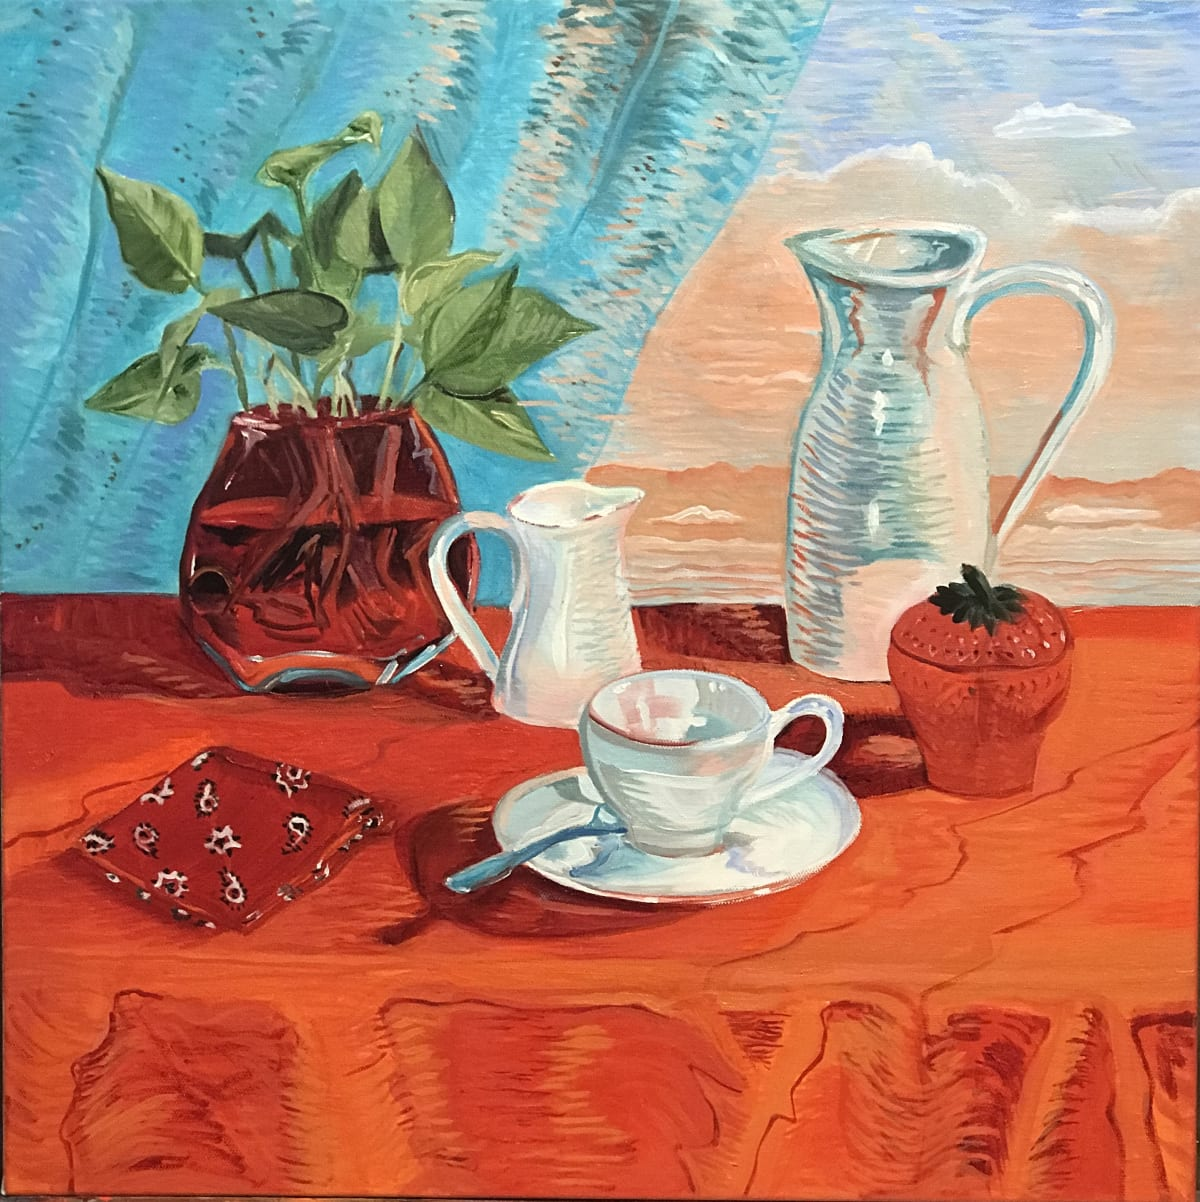 Tea with Cream and Sugar